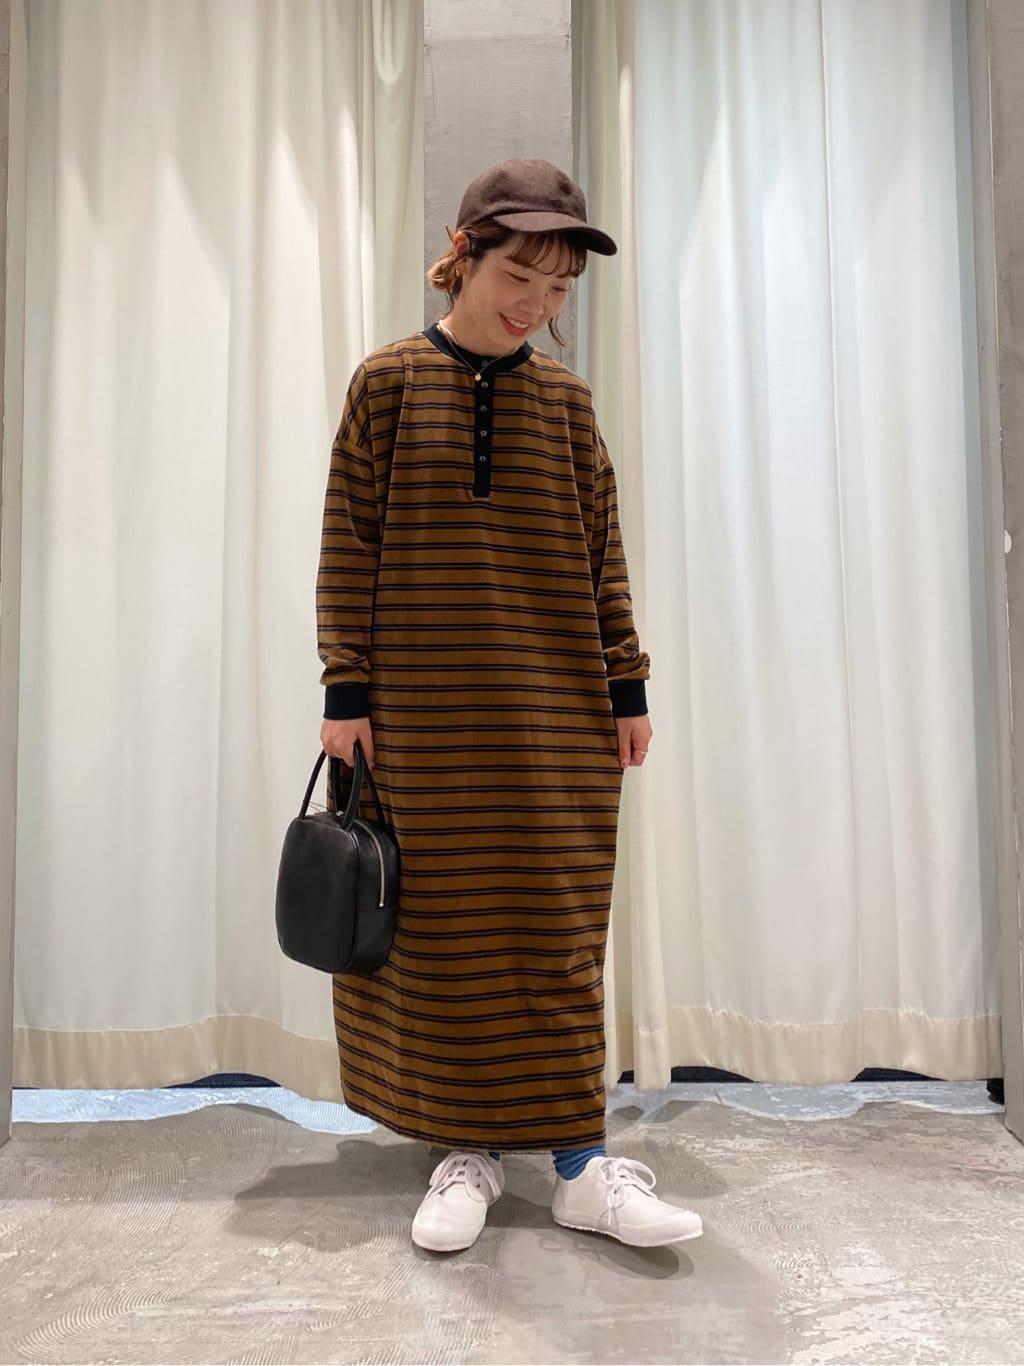 - CHILD WOMAN CHILD WOMAN , PAR ICI ルミネ横浜 身長:153cm 2021.10.02